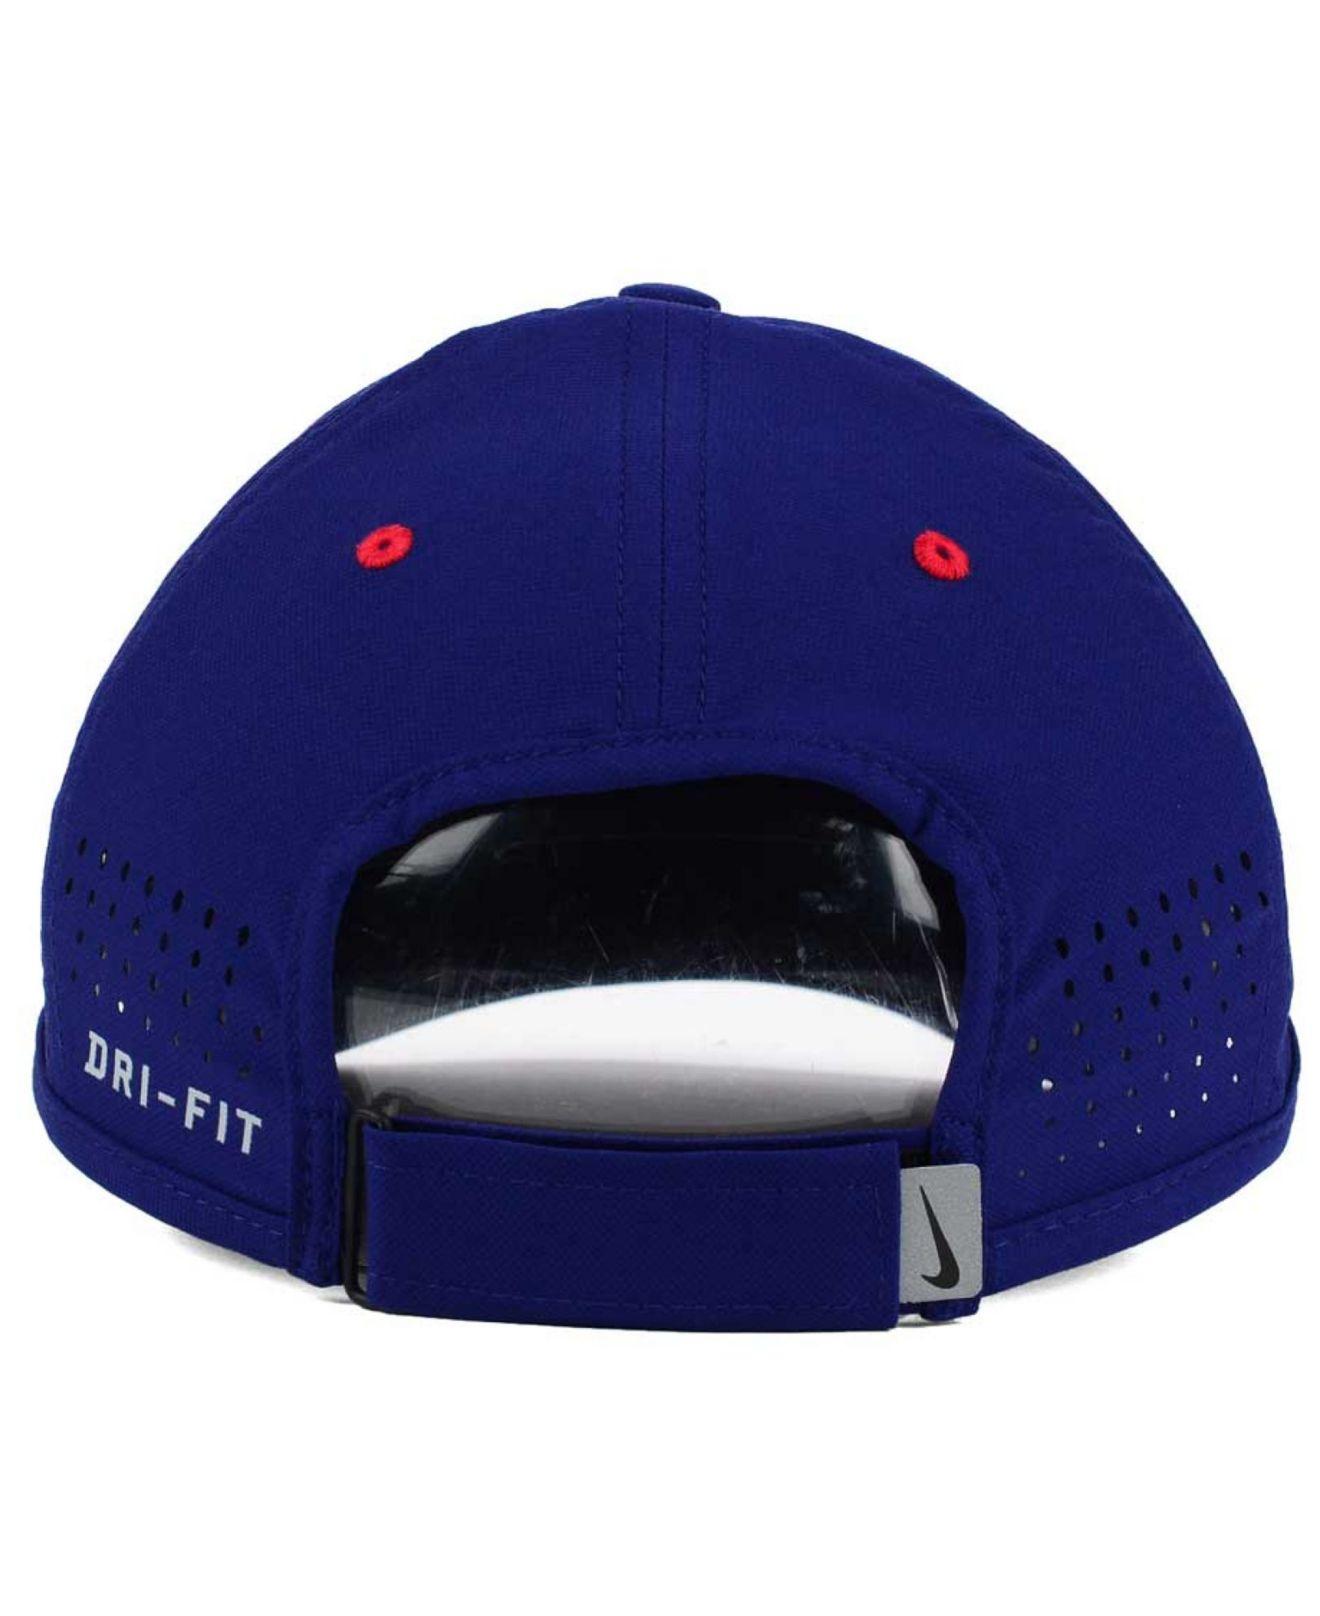 7d4073936a6d3 netherlands lyst nike texas rangers vapor swoosh adjustable cap in blue for  men 47515 bd6ea